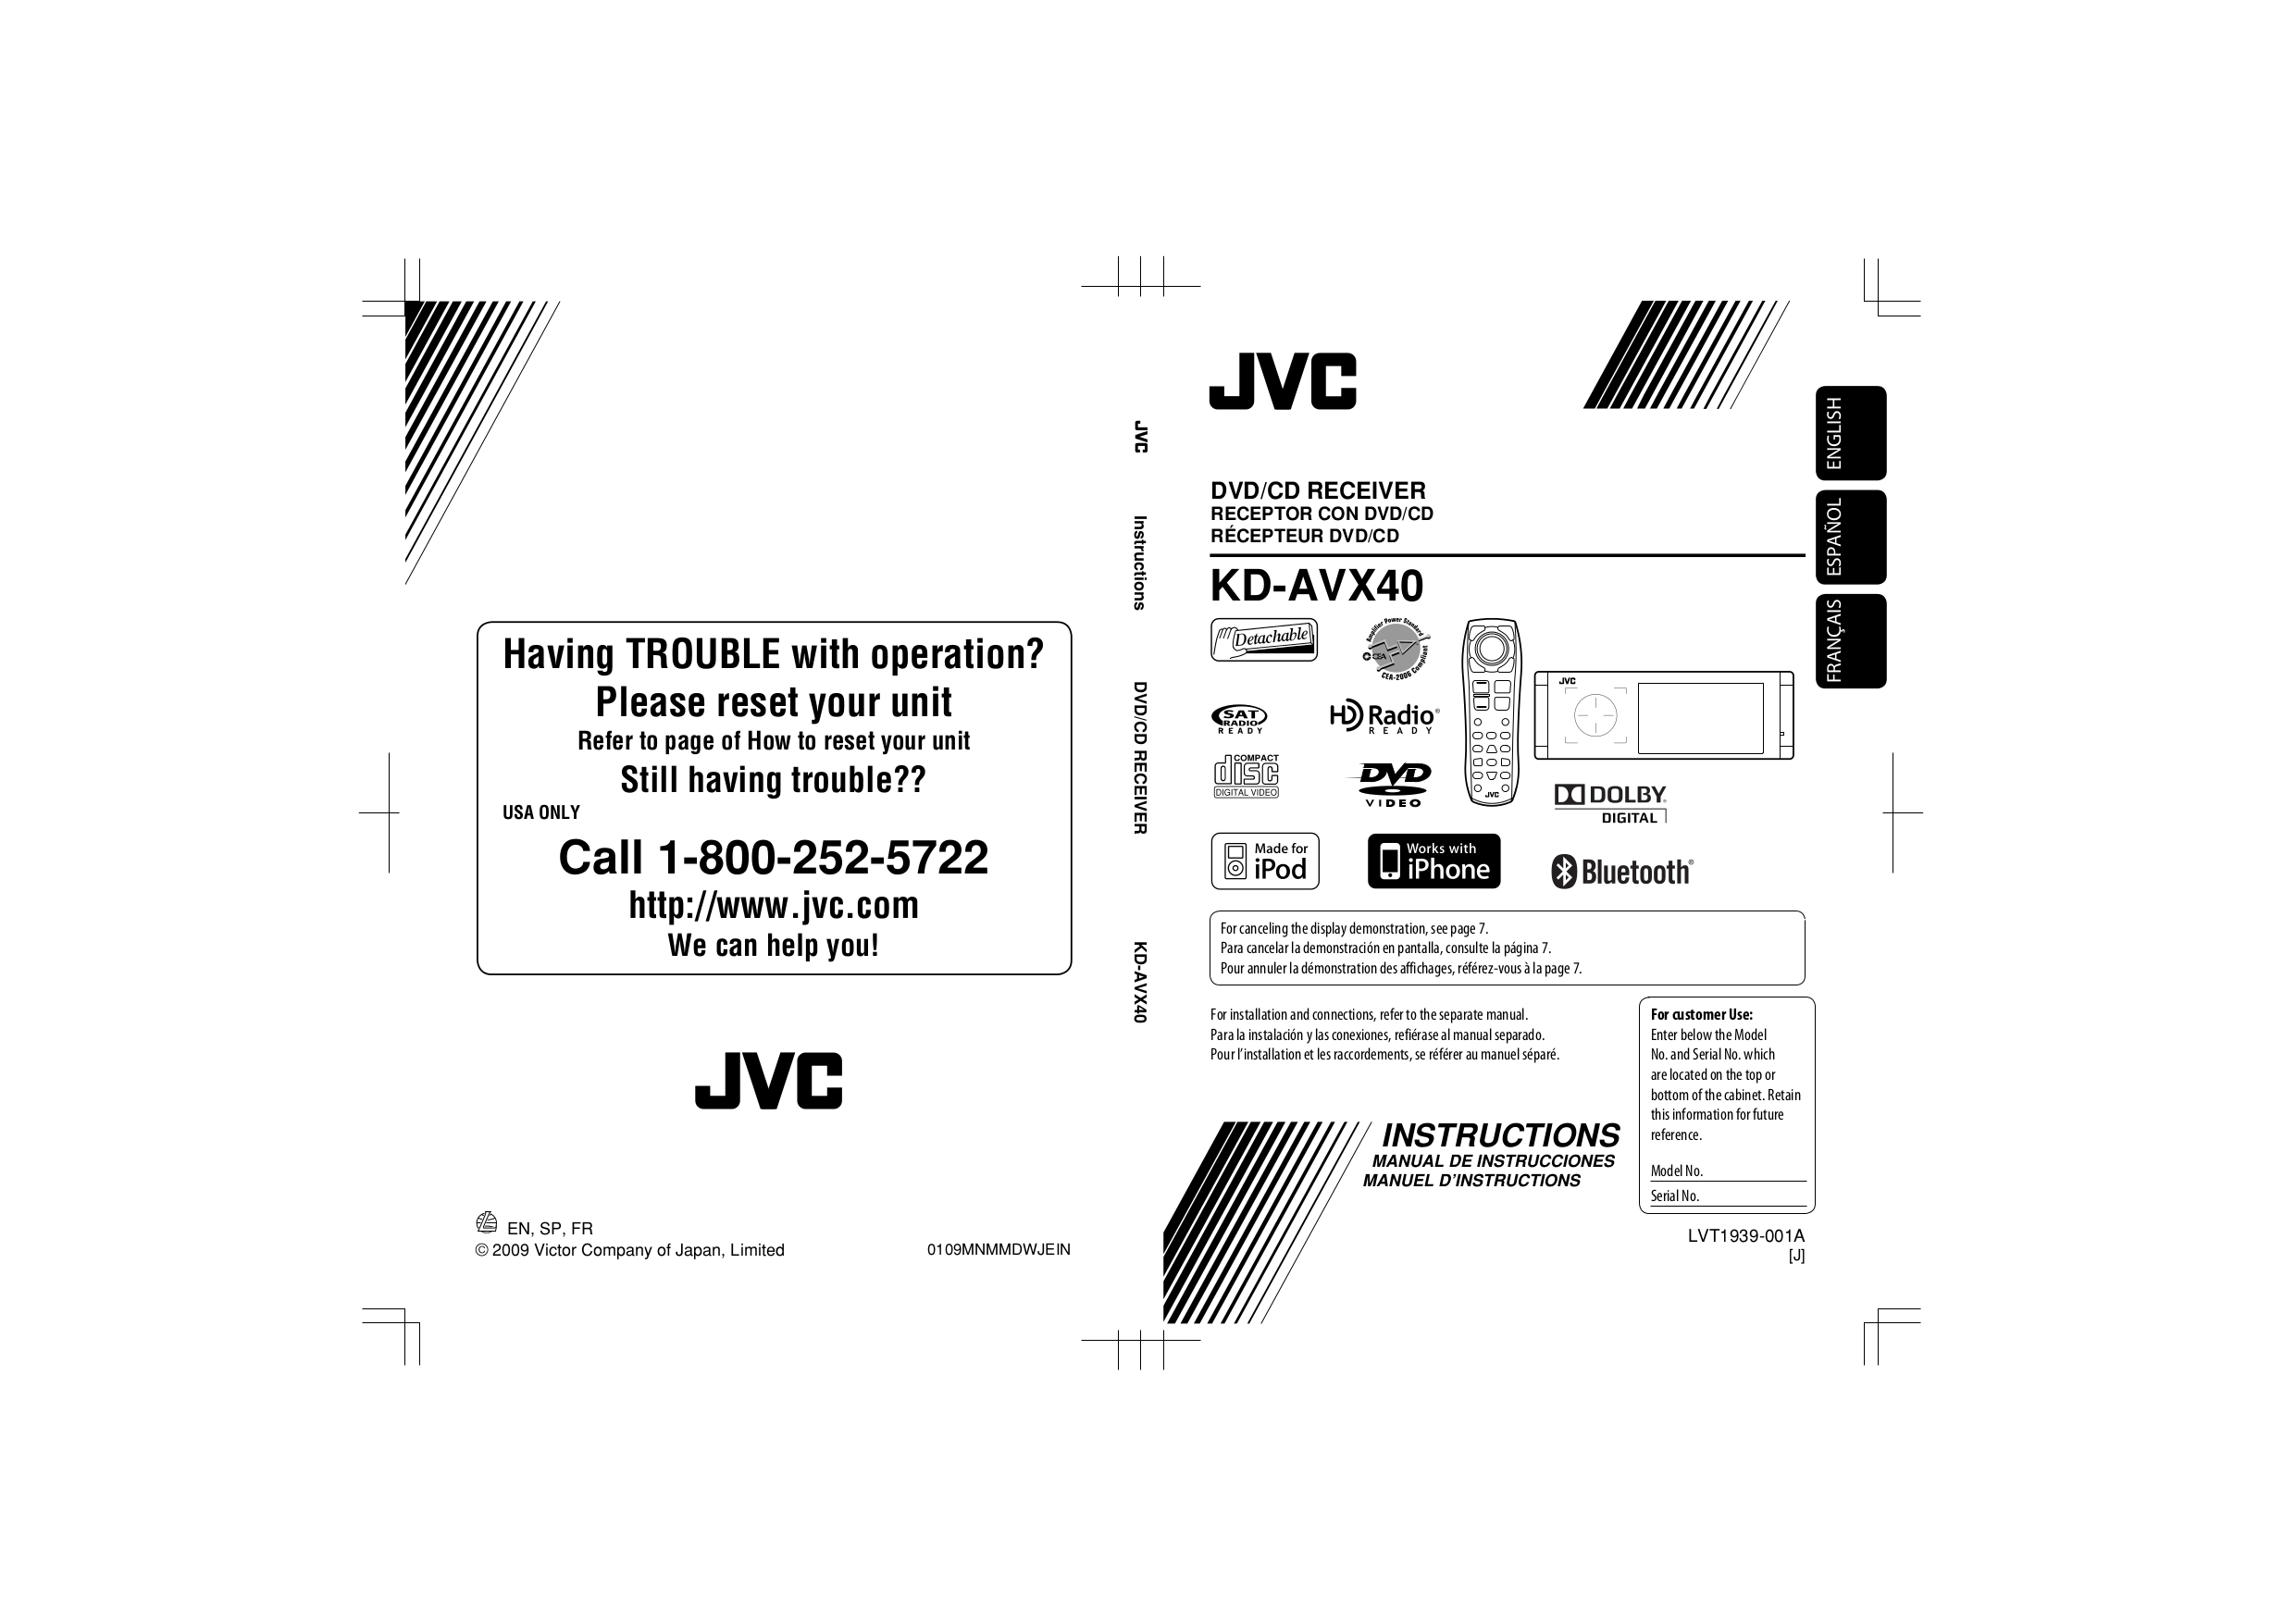 Download Free For Jvc Kd Avx40 Car Video Manual